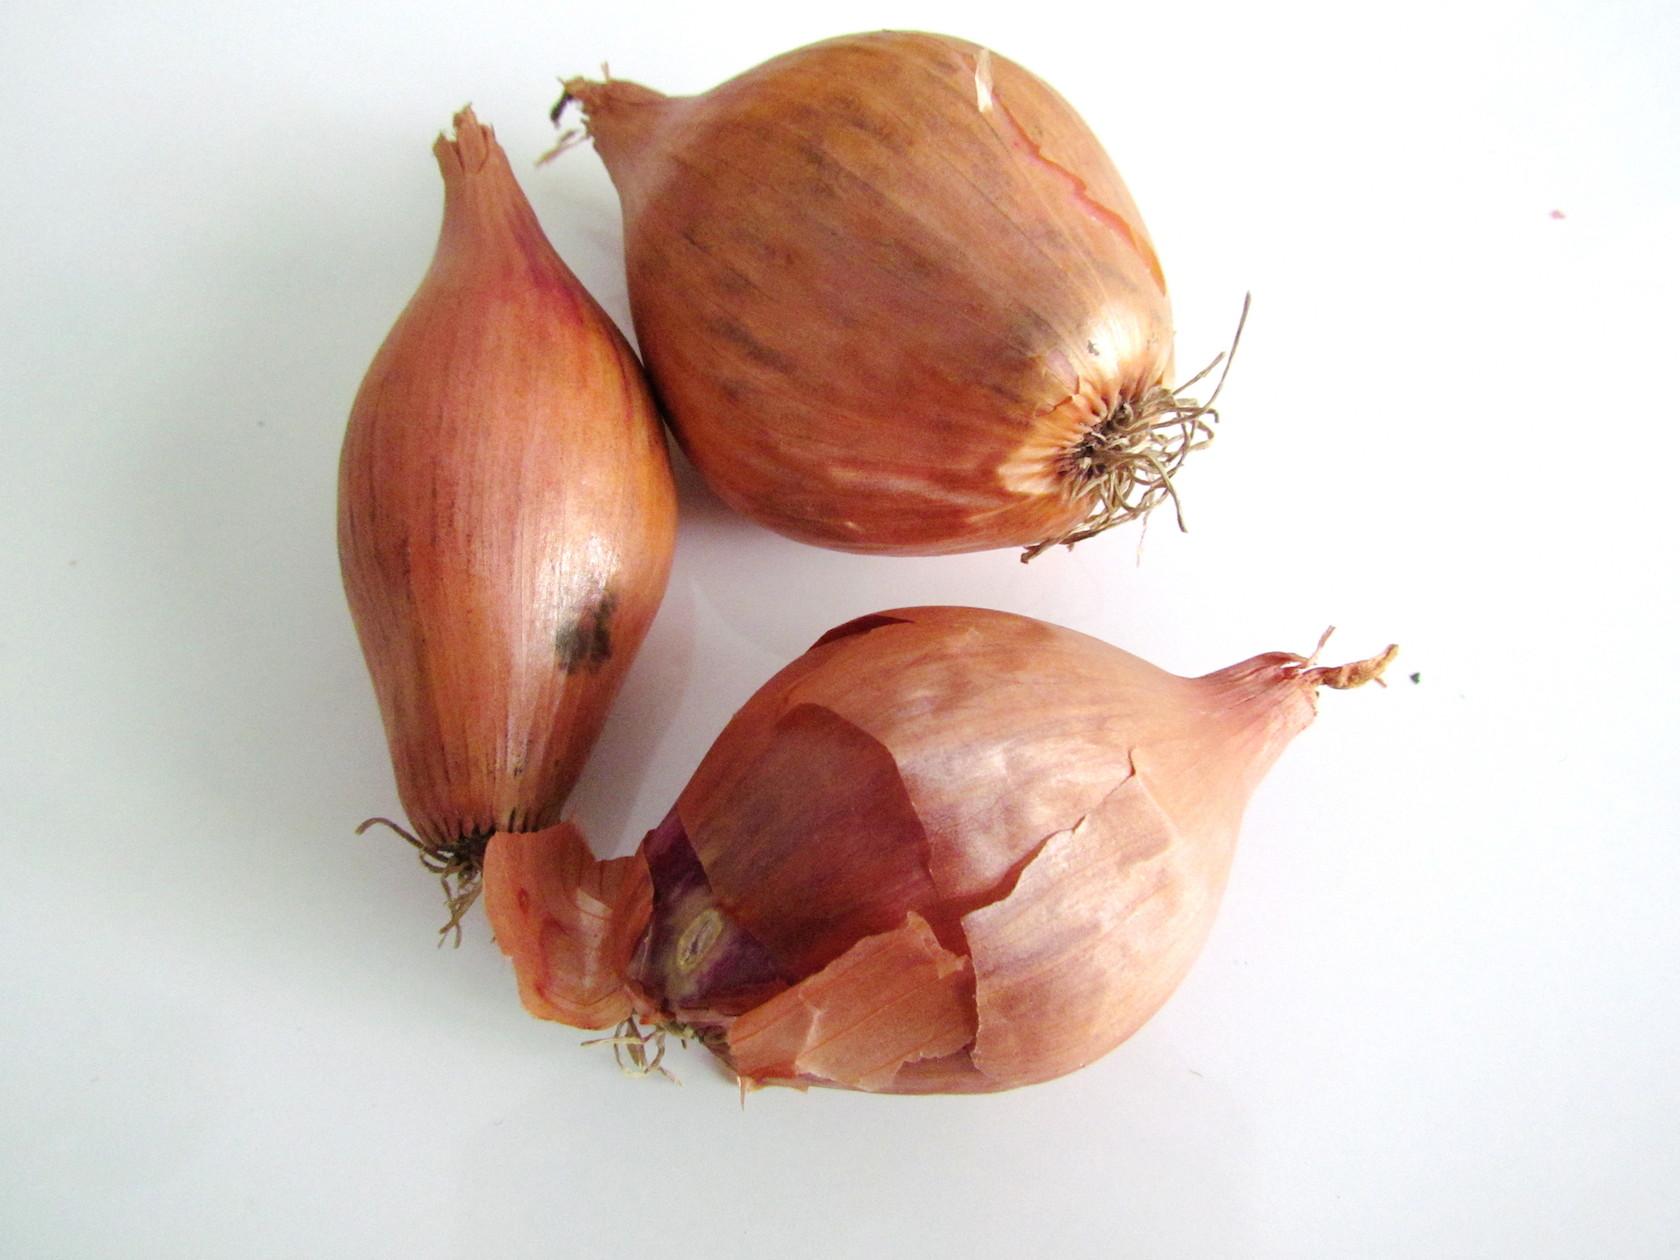 seasonal produce guide for switzerland: april